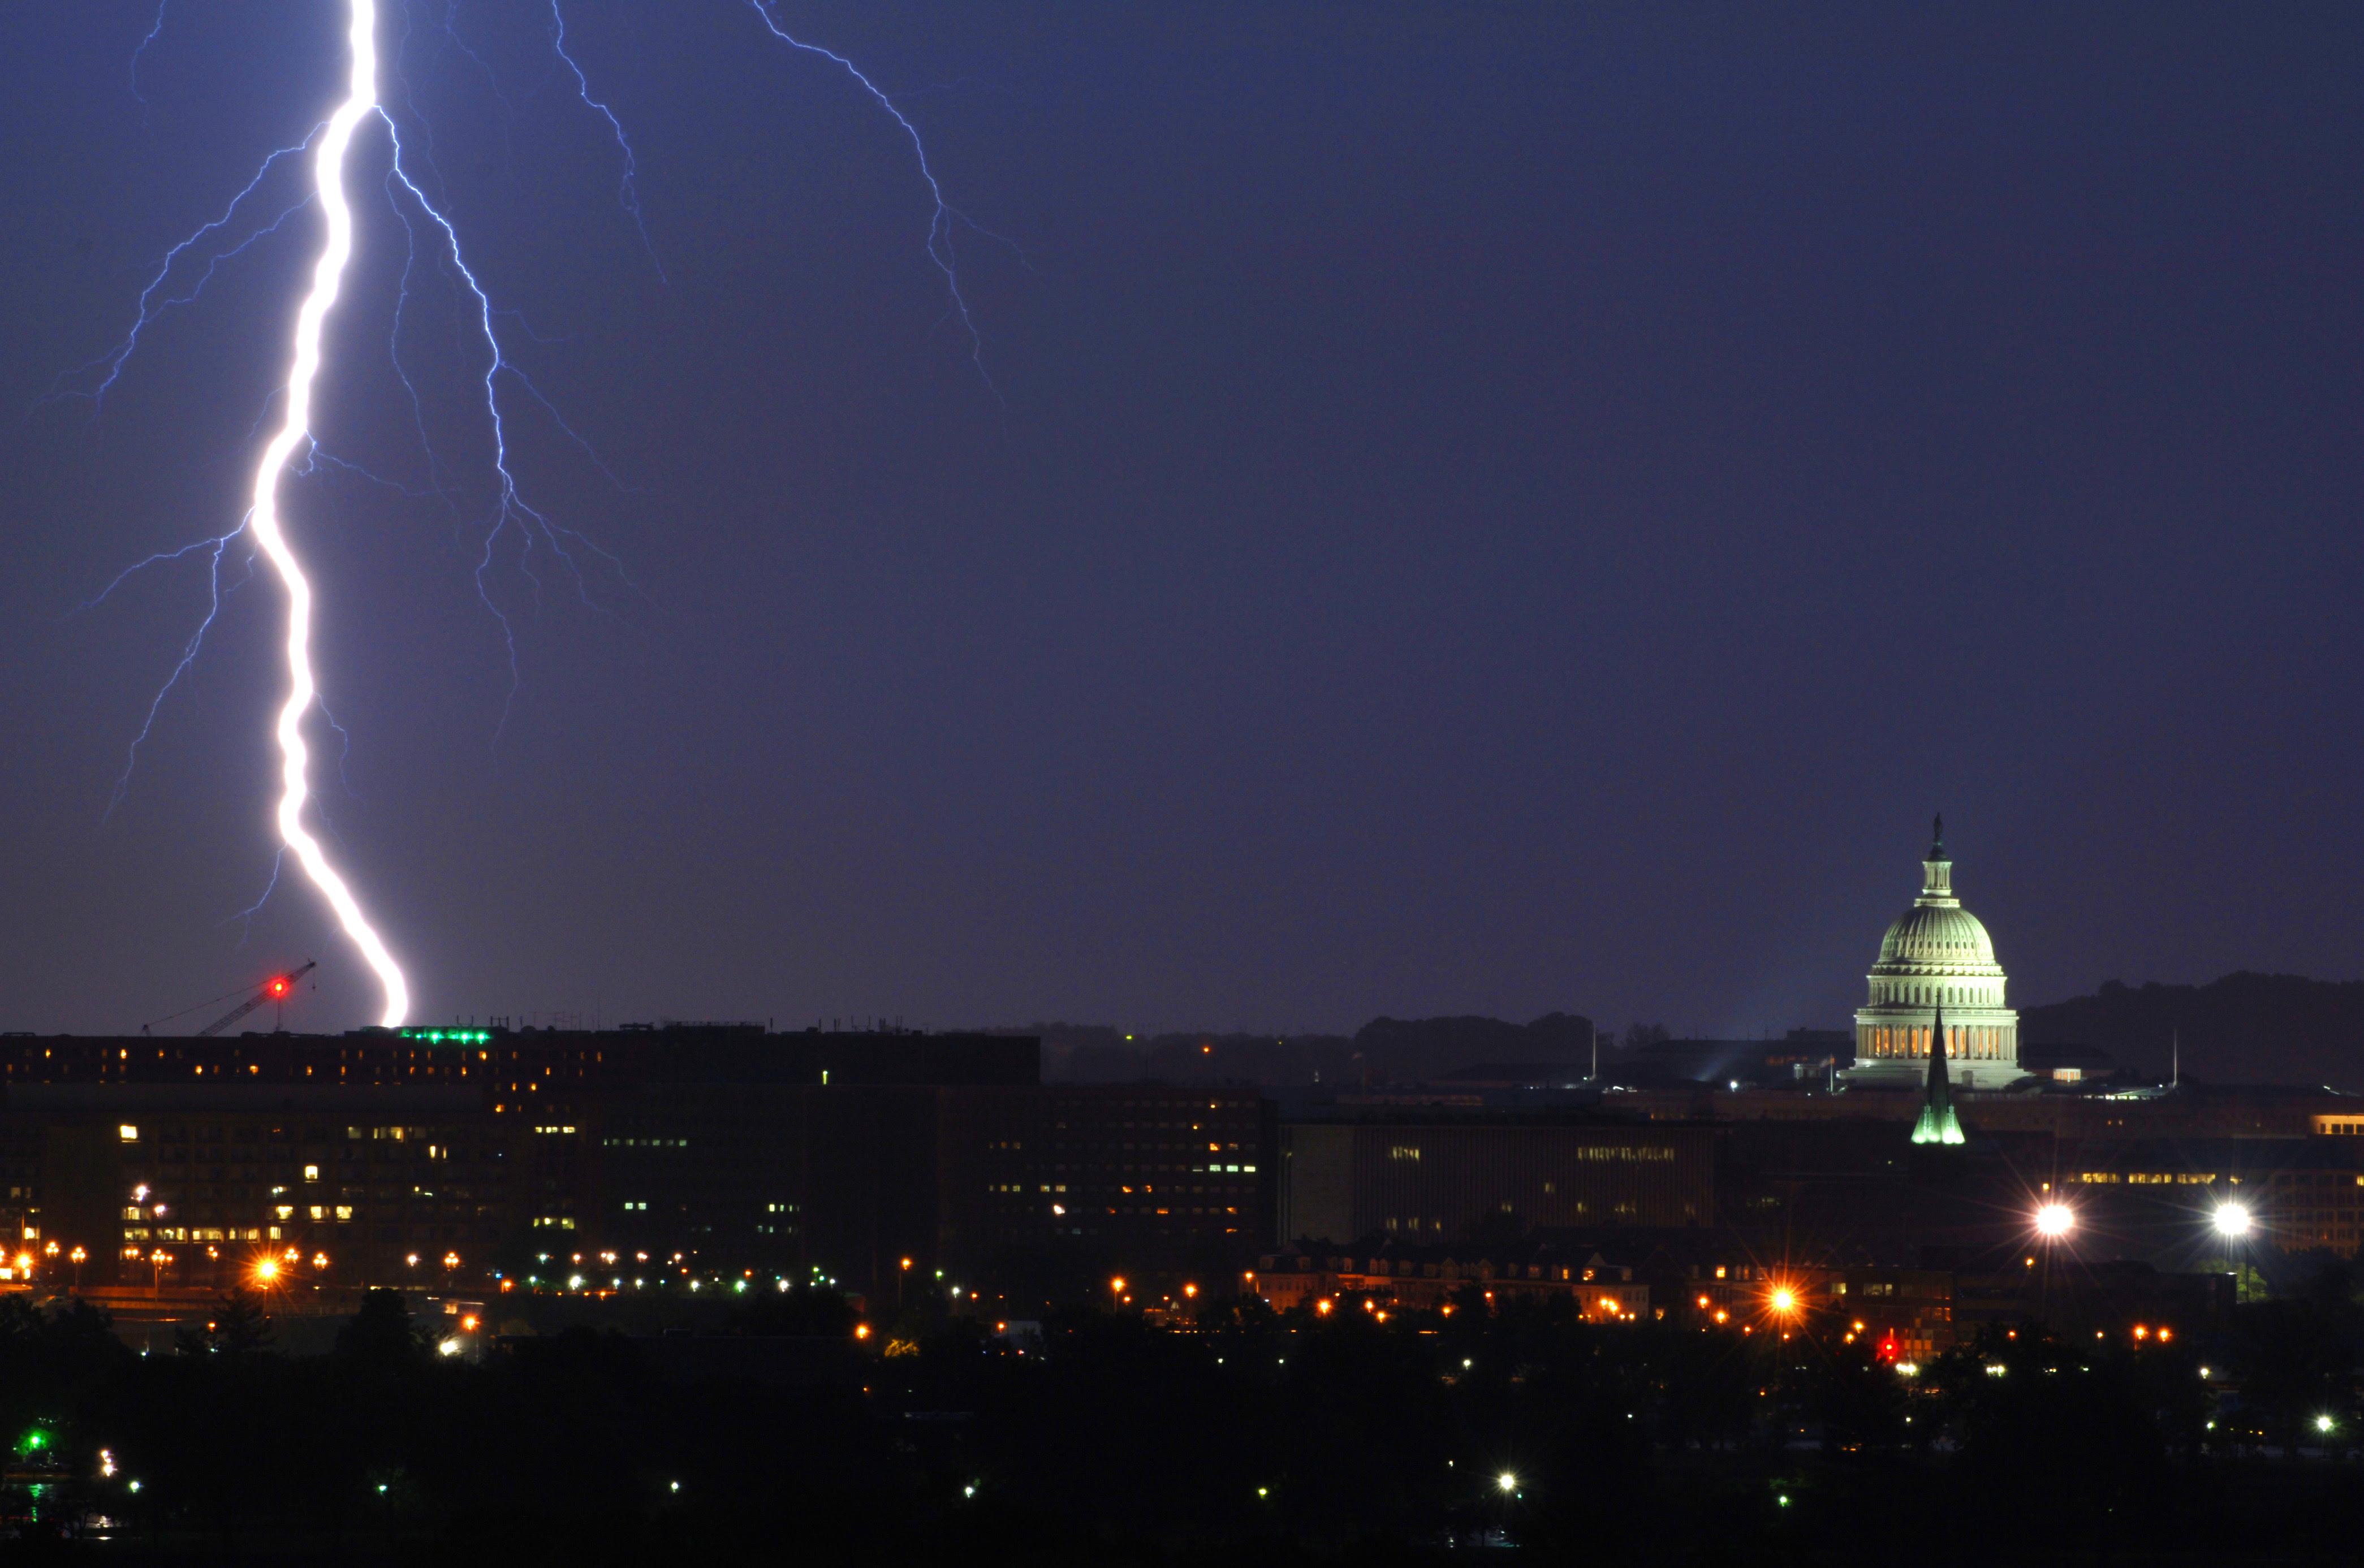 http://upload.wikimedia.org/wikipedia/commons/f/f4/Lightning_strike_near_Capitol_building.jpg